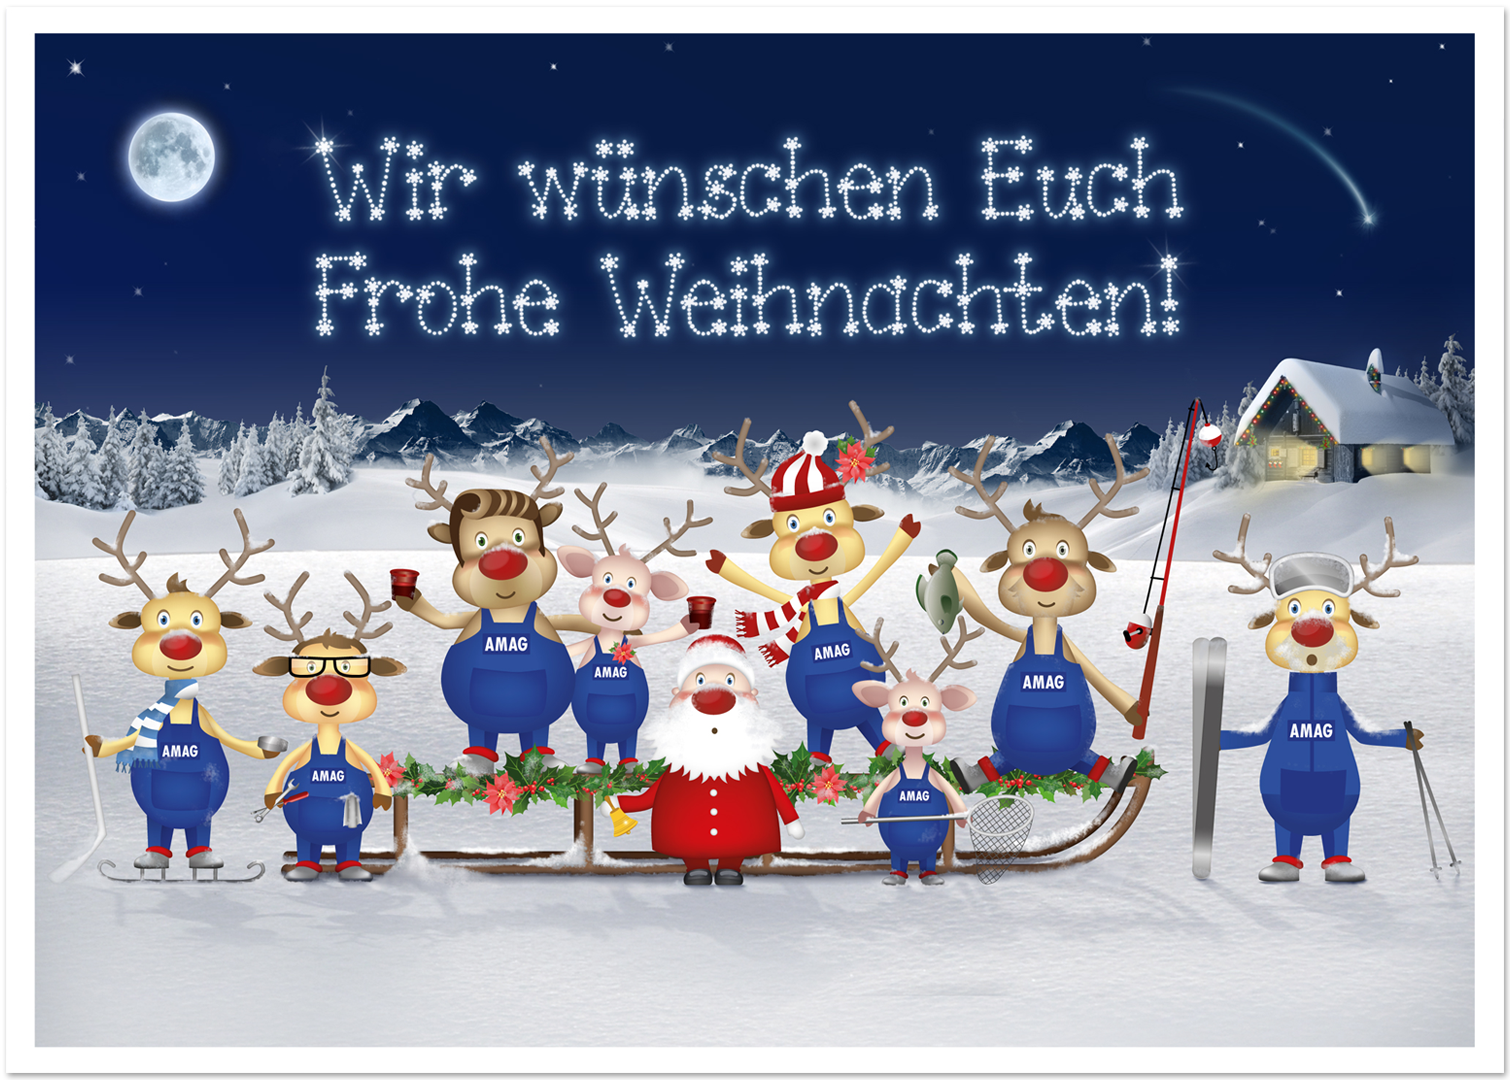 AMAG Christmas Website – Askuchita